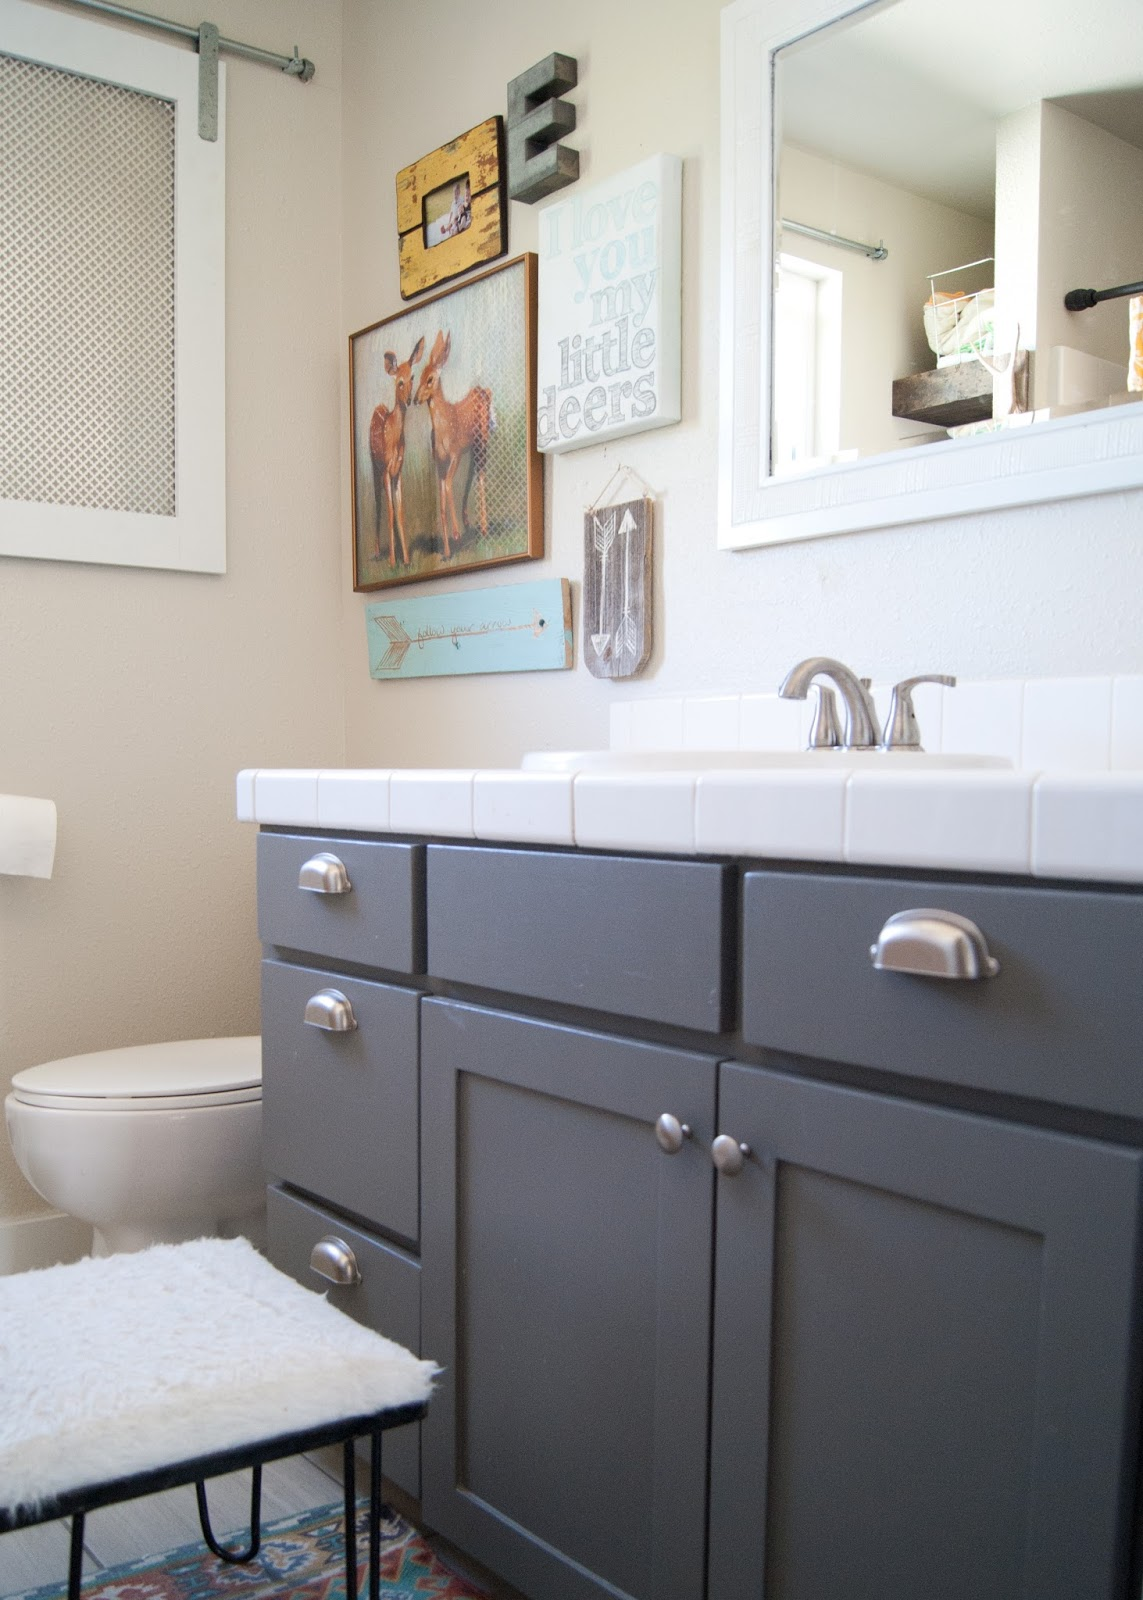 Zinc Bathroom Vanity project kid's bathroom - reveal! | averie lane: project kid's